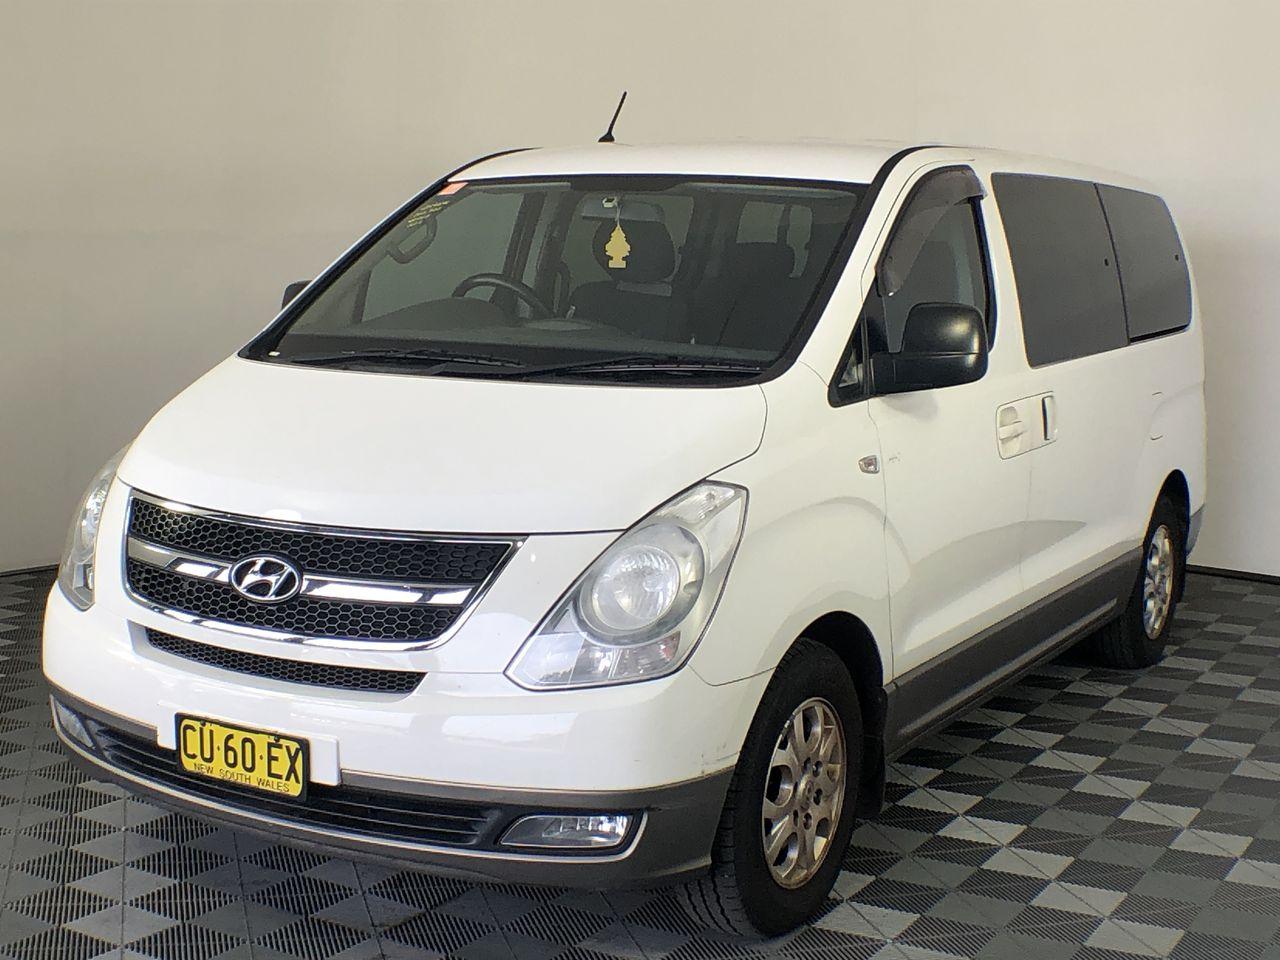 2013 Hyundai iMAX TQ Turbo Diesel Automatic 8 Seats People Mover